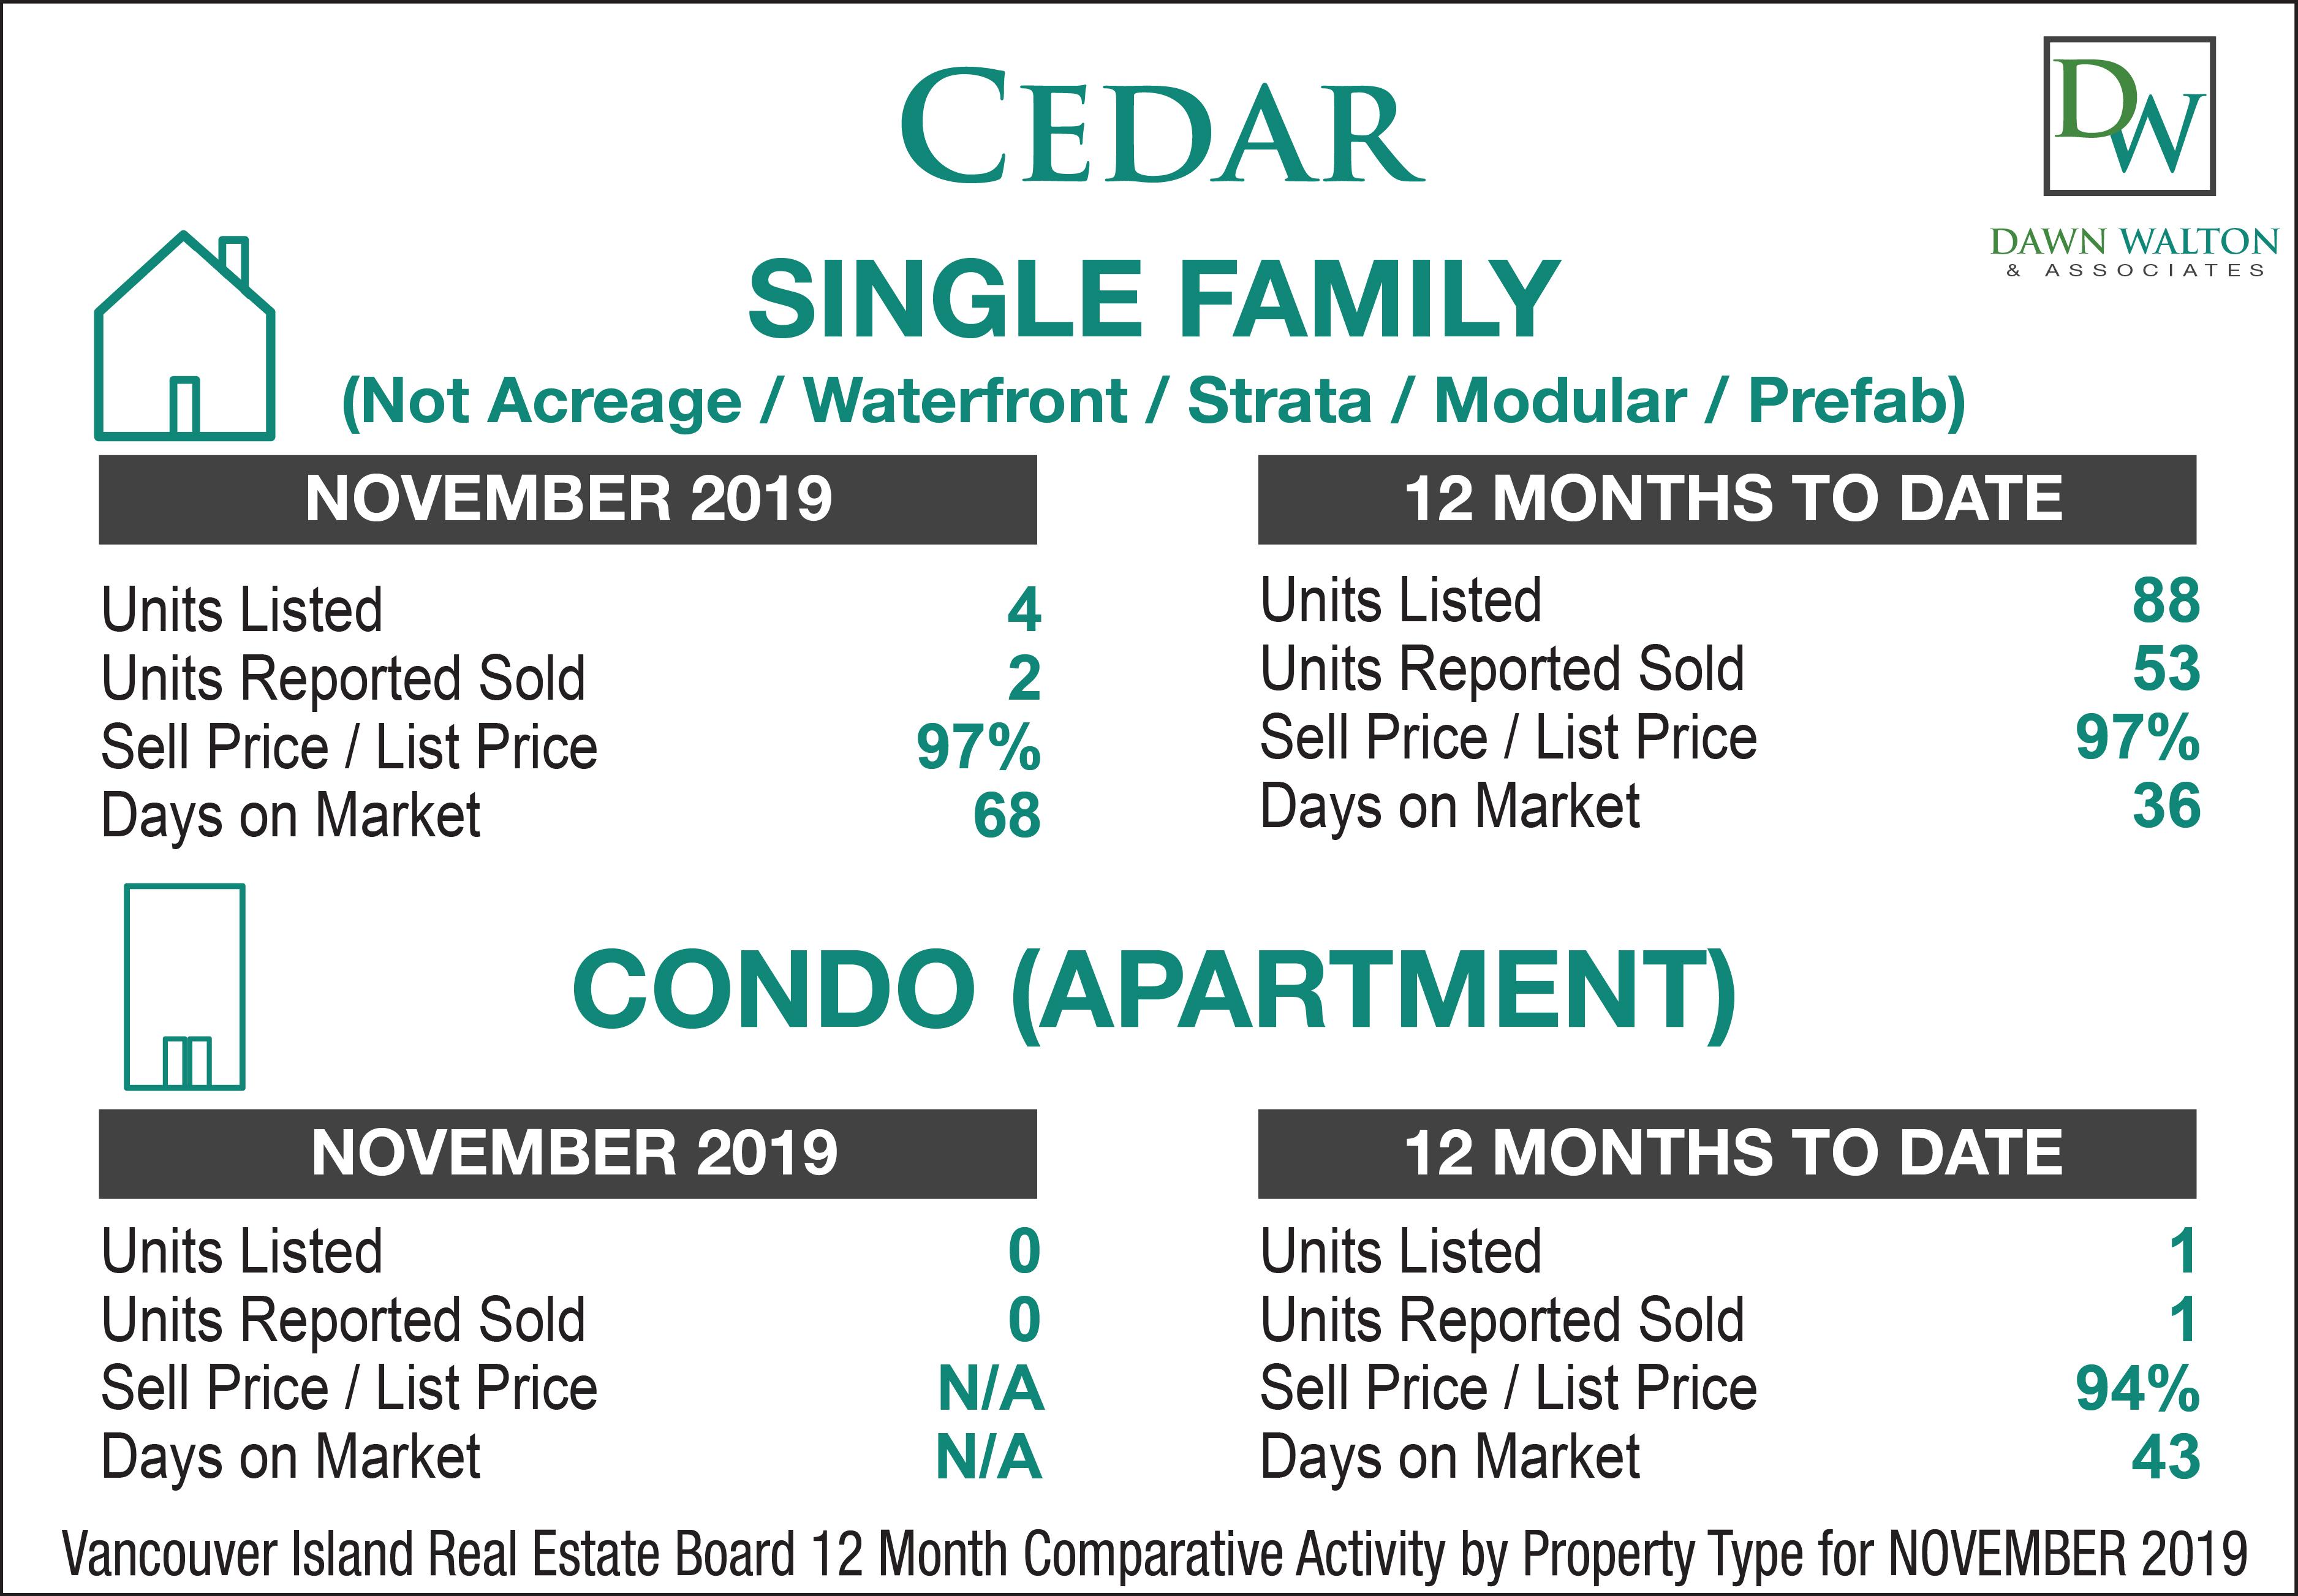 Cedar Cinnabar Valley Real Estate Market Stats November  2019 - Nanaimo Realtor Dawn Walton